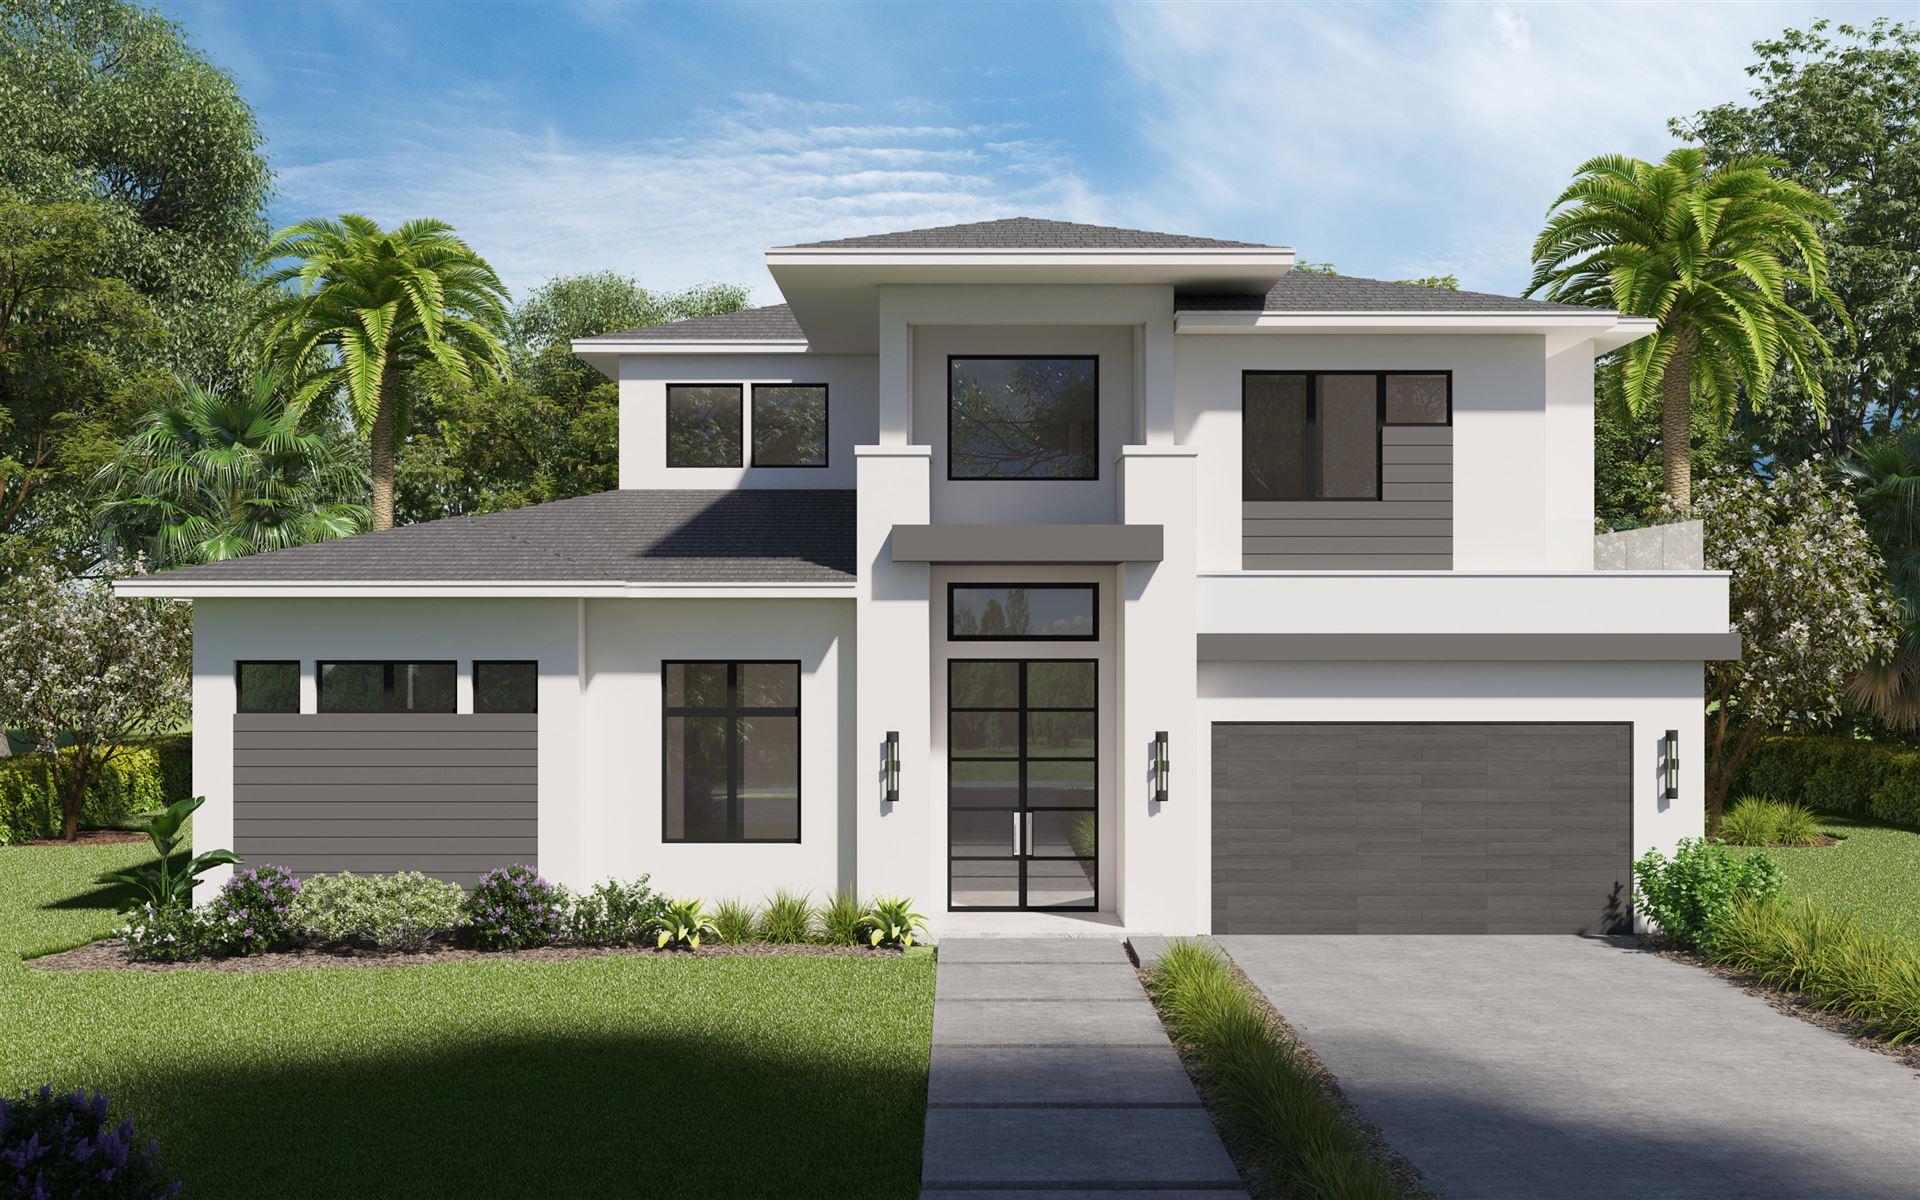 Photo of 3096 Blue Cypress Lane, Wellington, FL 33414 (MLS # RX-10716837)